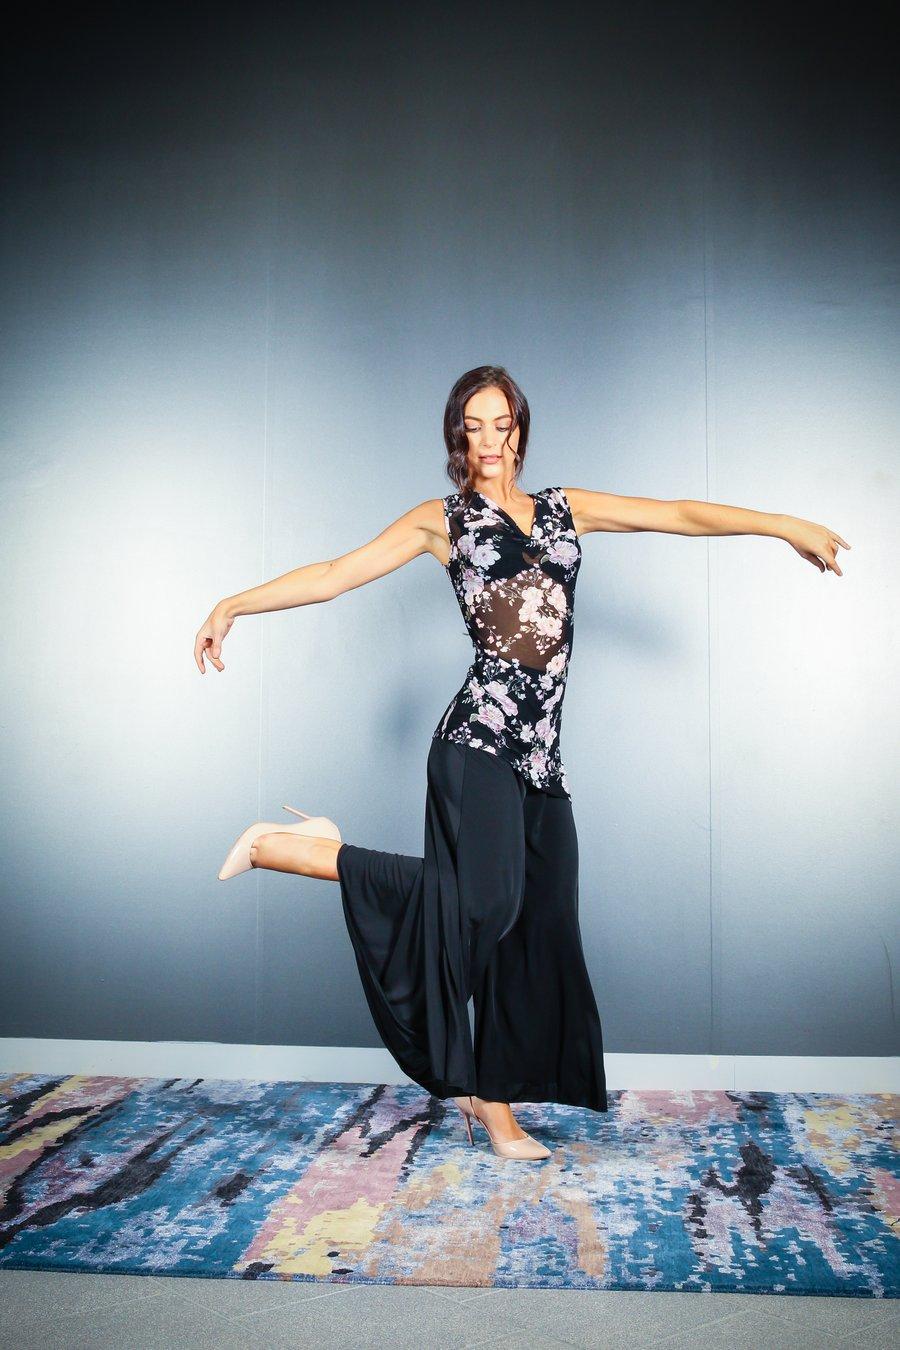 Image of Ava Top - Cherry Blossom E1312 Dancewear latin ballroom